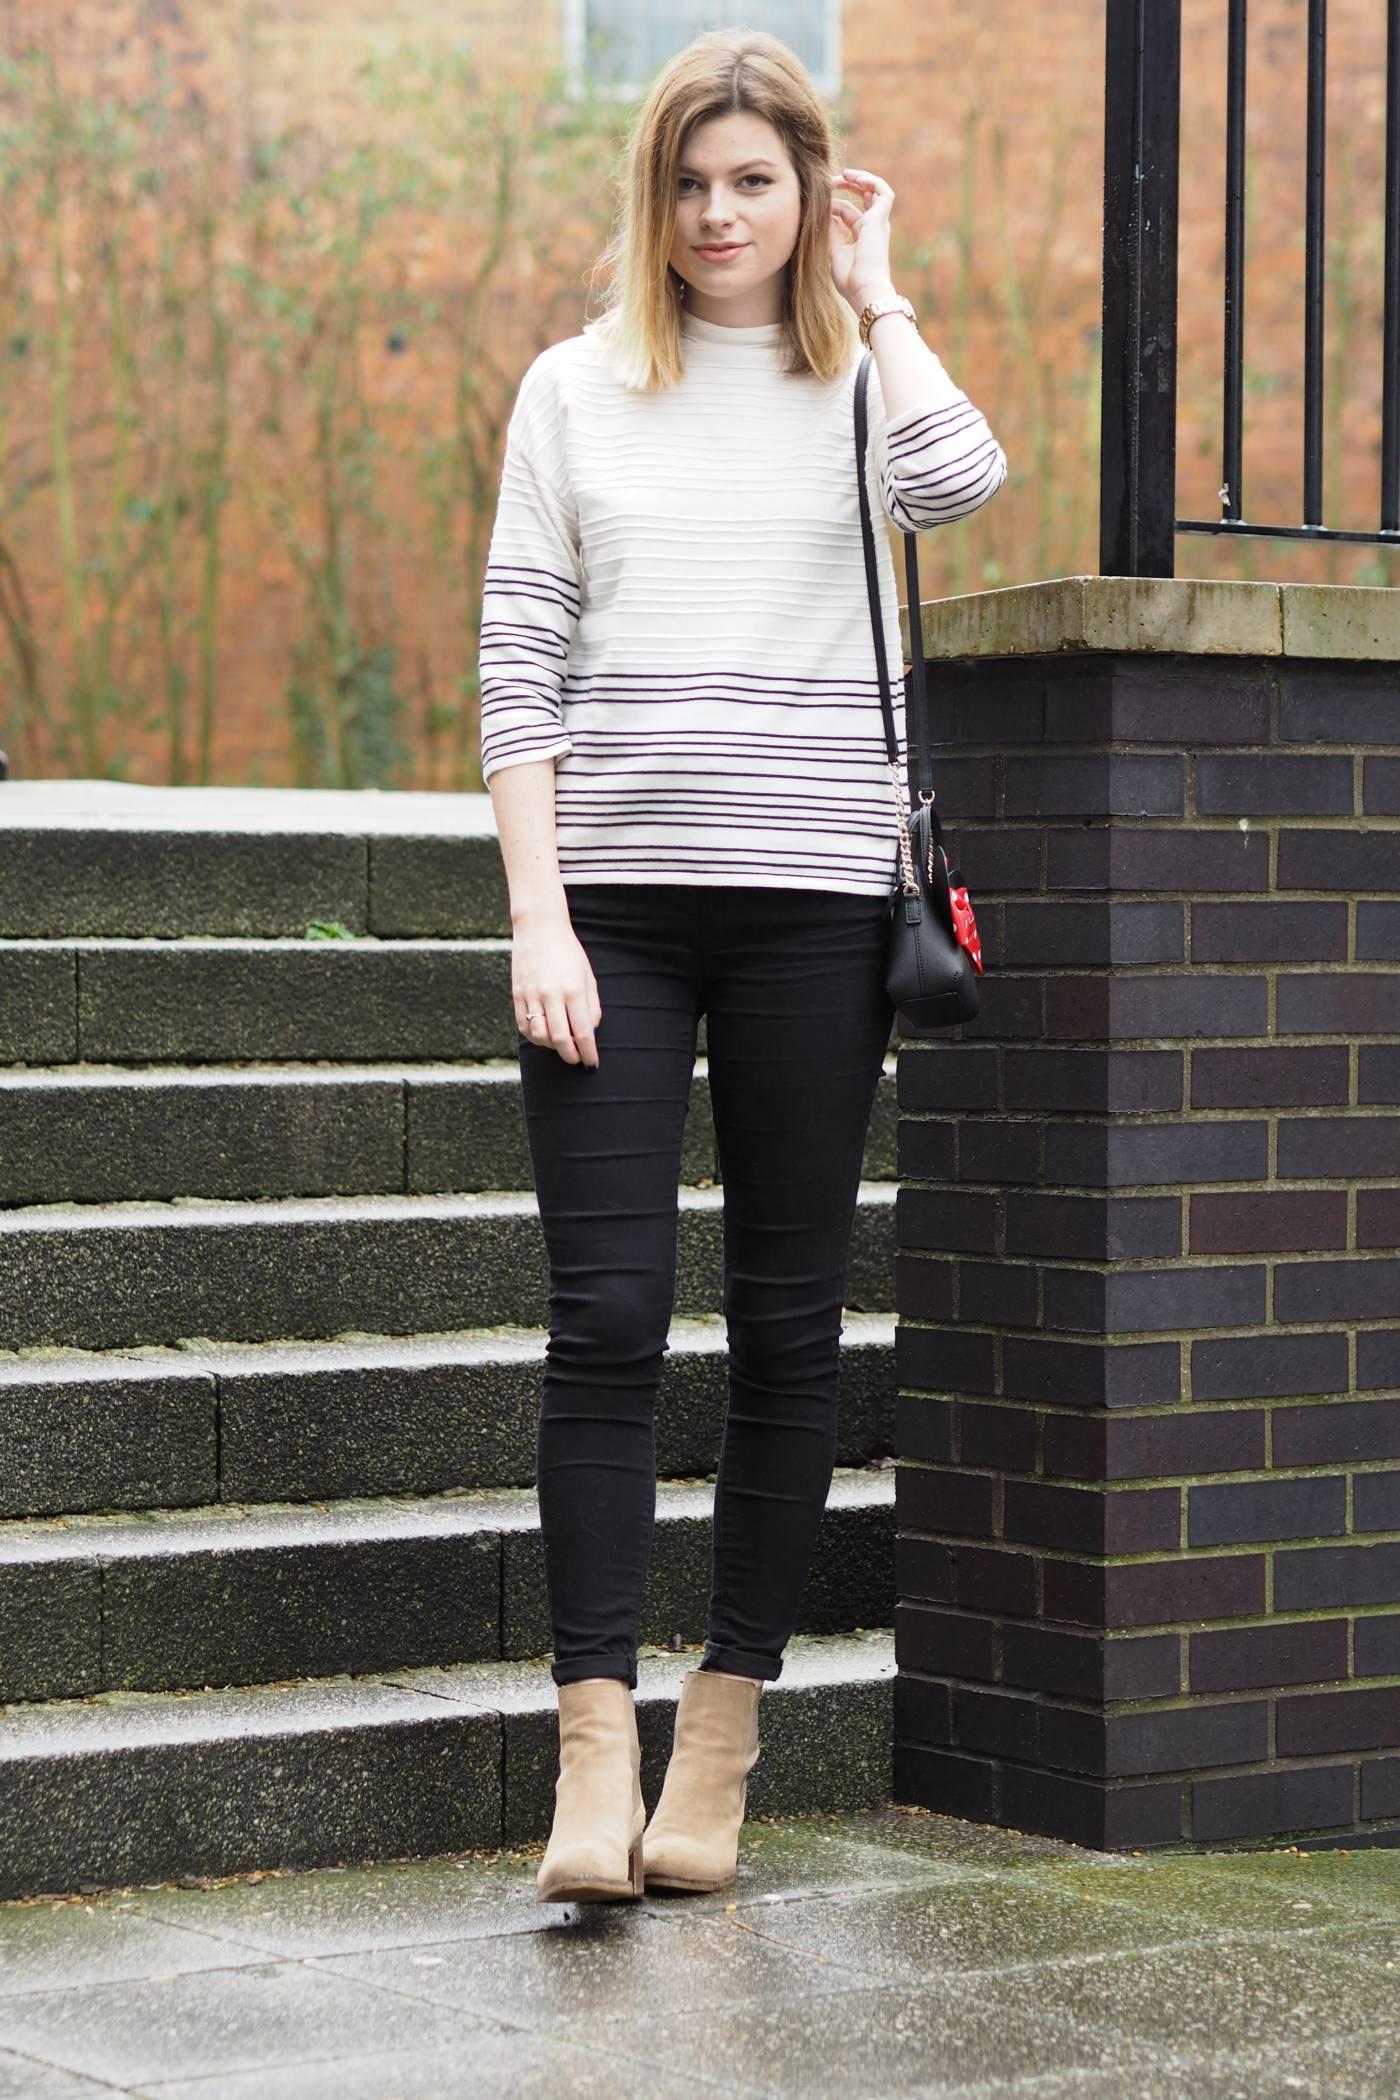 Kate Spade x Minnie Mouse, Style blogger, Milton Keynes, Blogger, Sophie etc